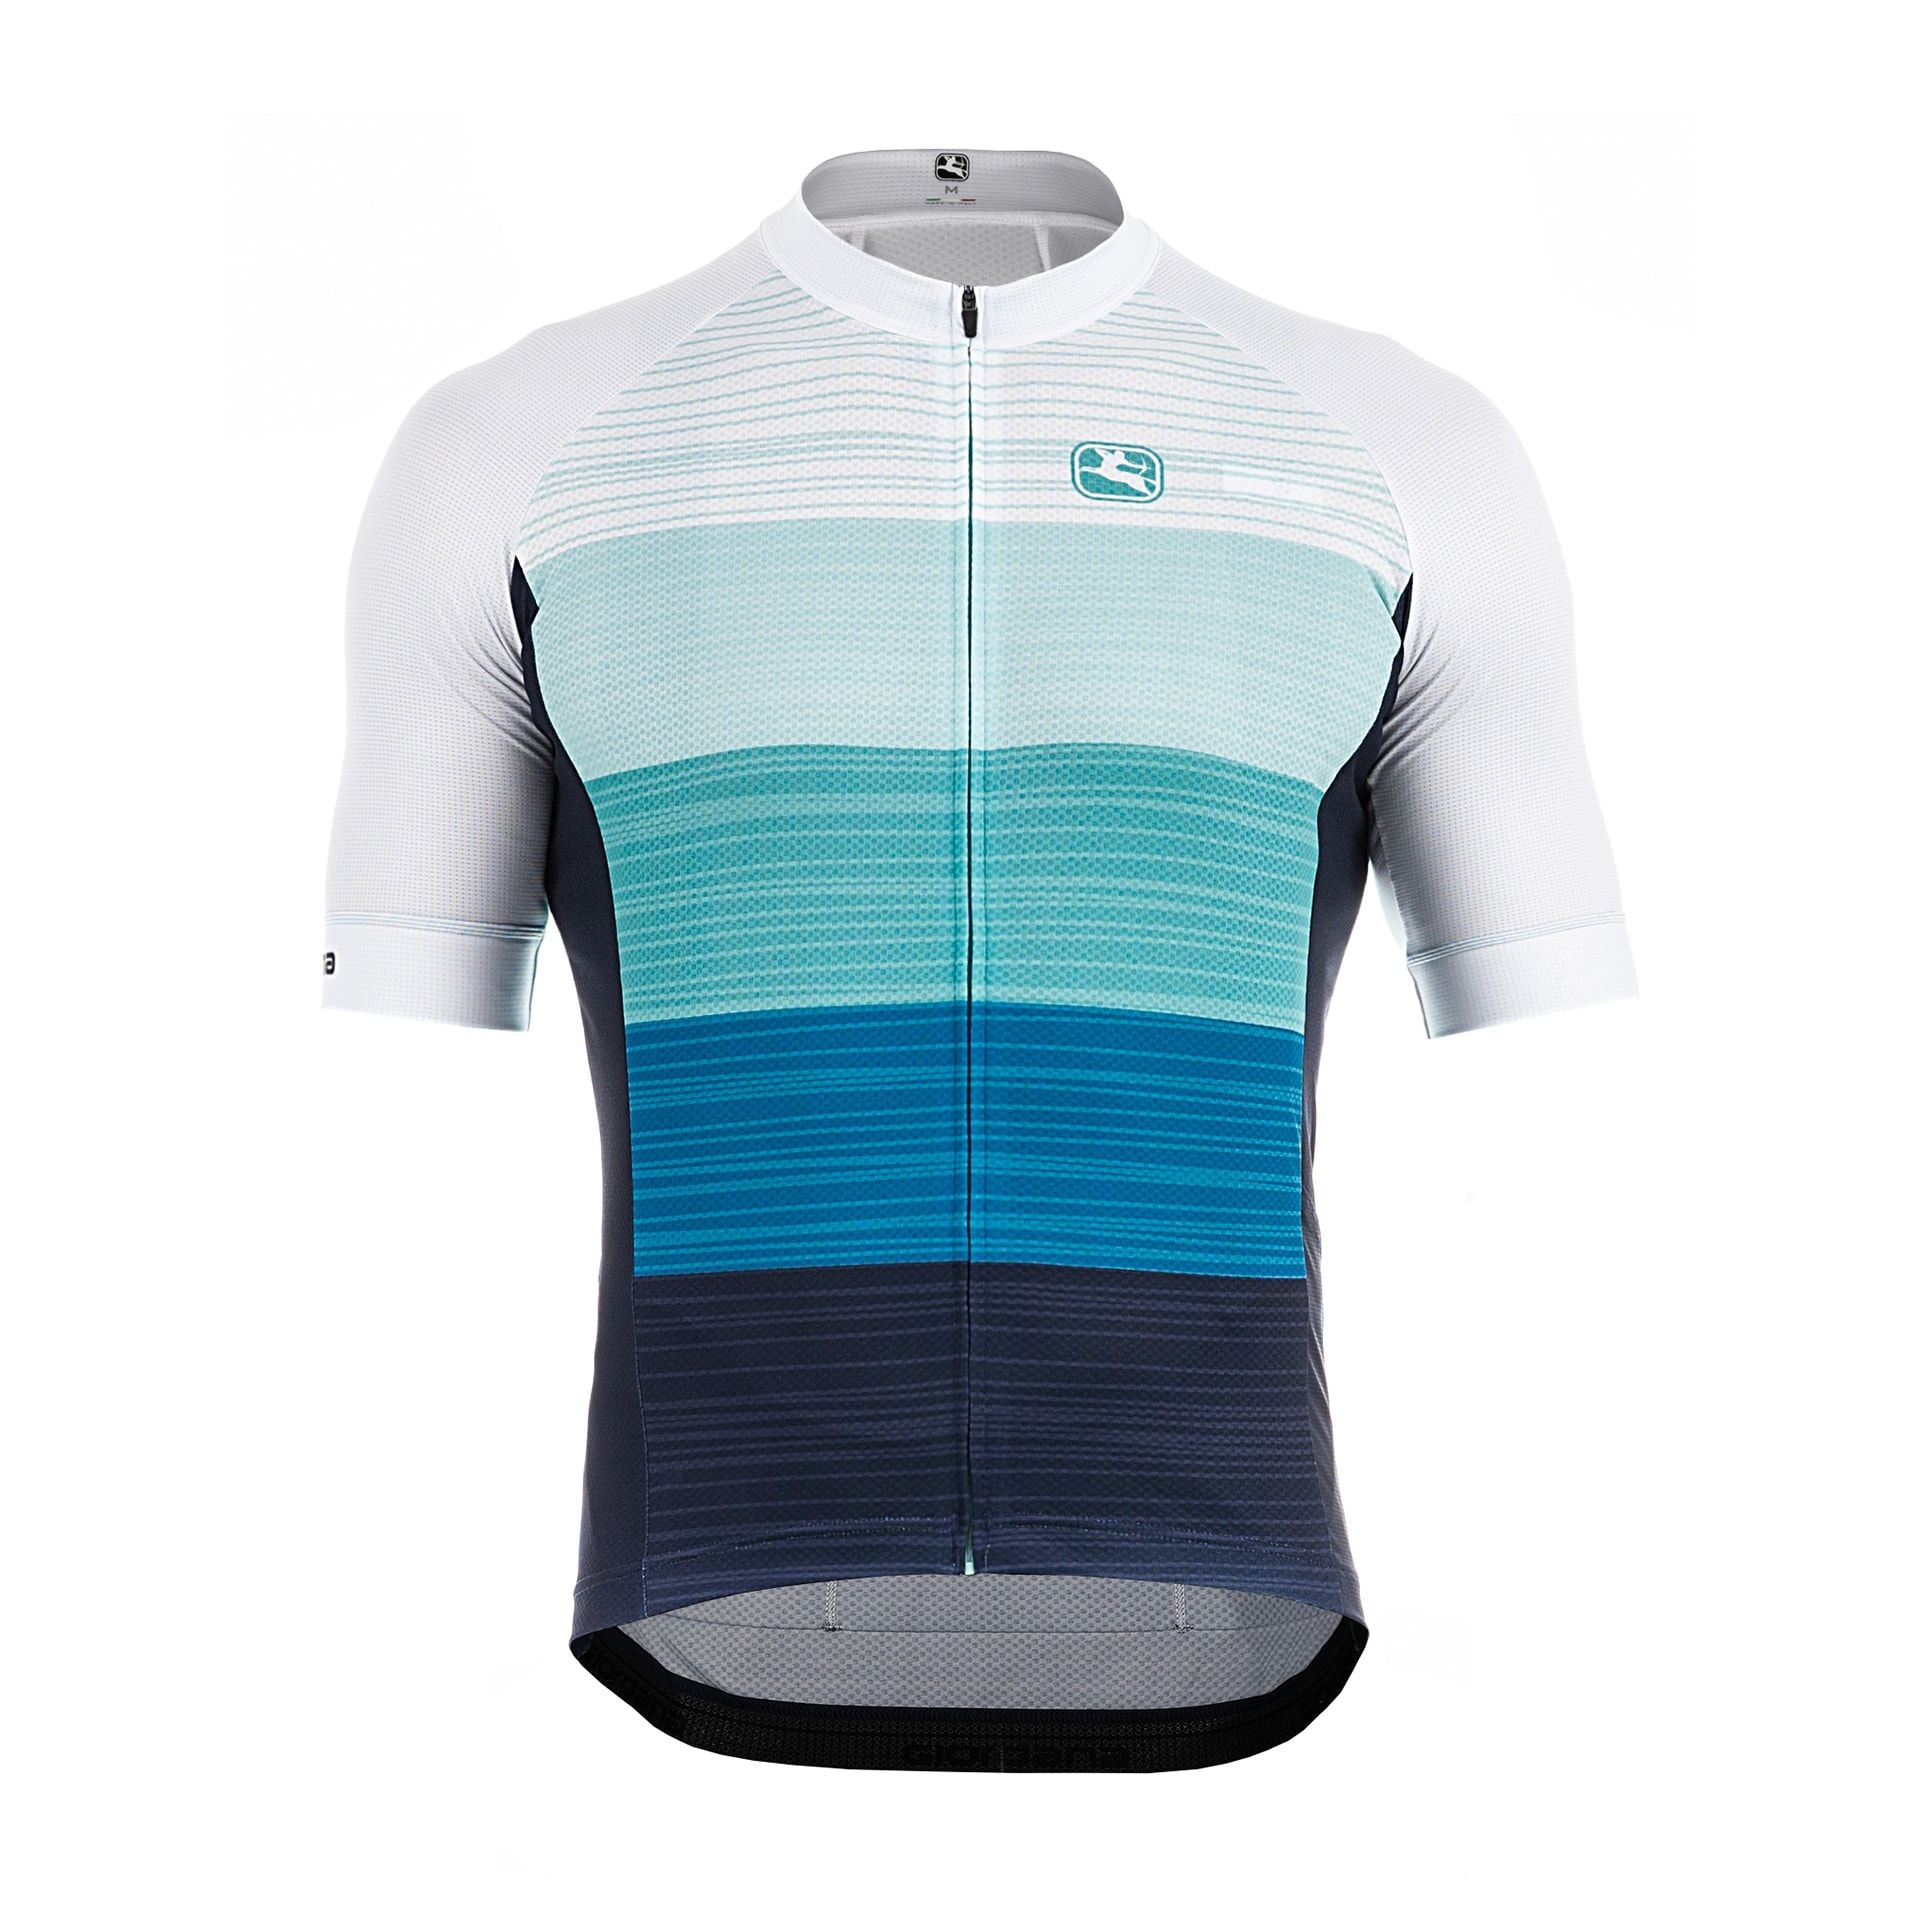 Moda Surf Tenax Pro Short Sleeve Jersey  7d88111b8